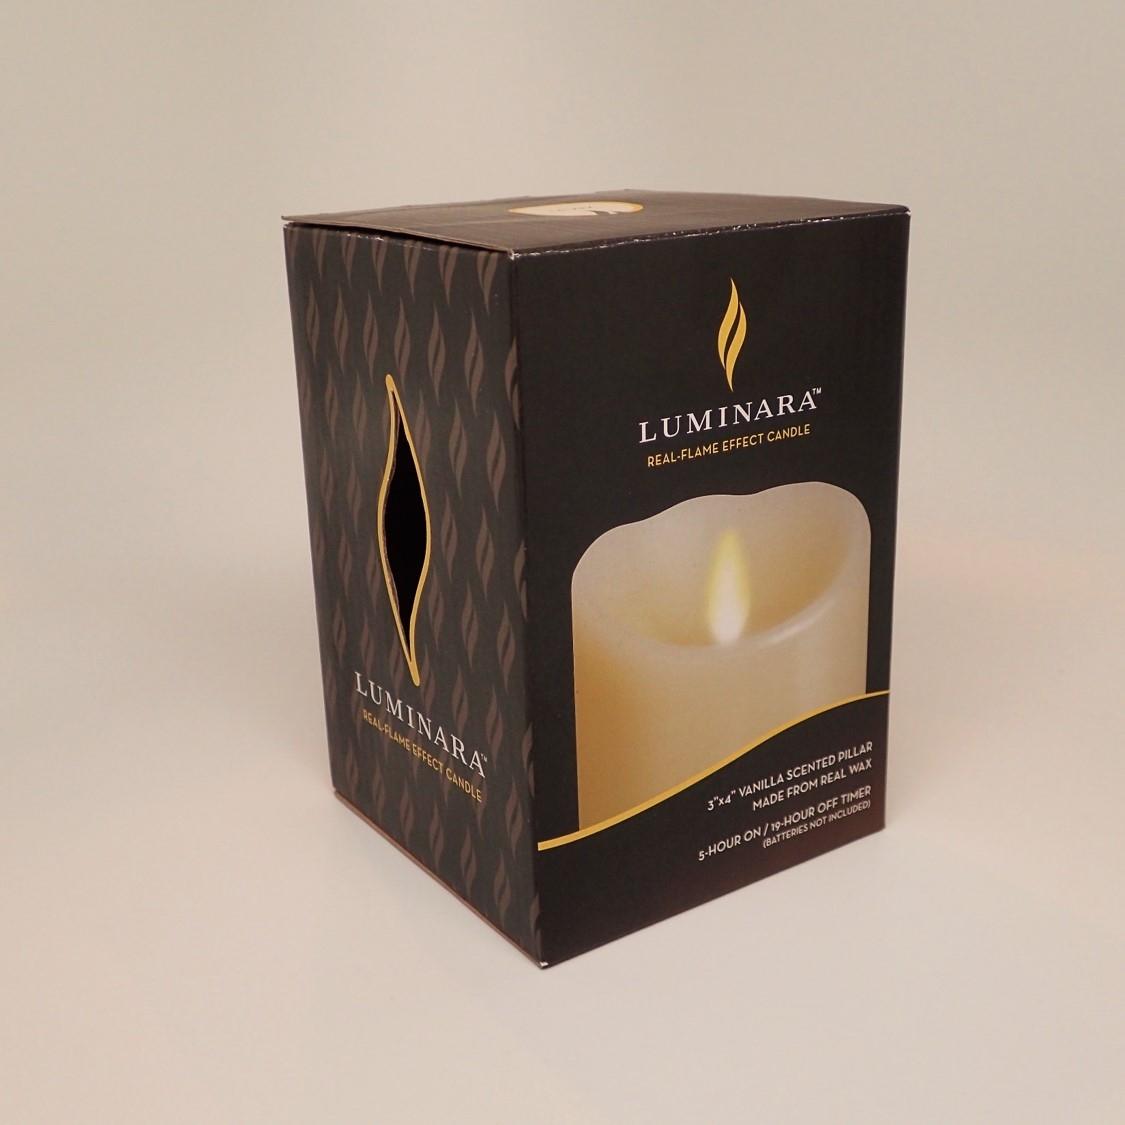 "Luminara 5"" Flameless Candle Pillar Glitter LED Light Real Flame Effect Remote"